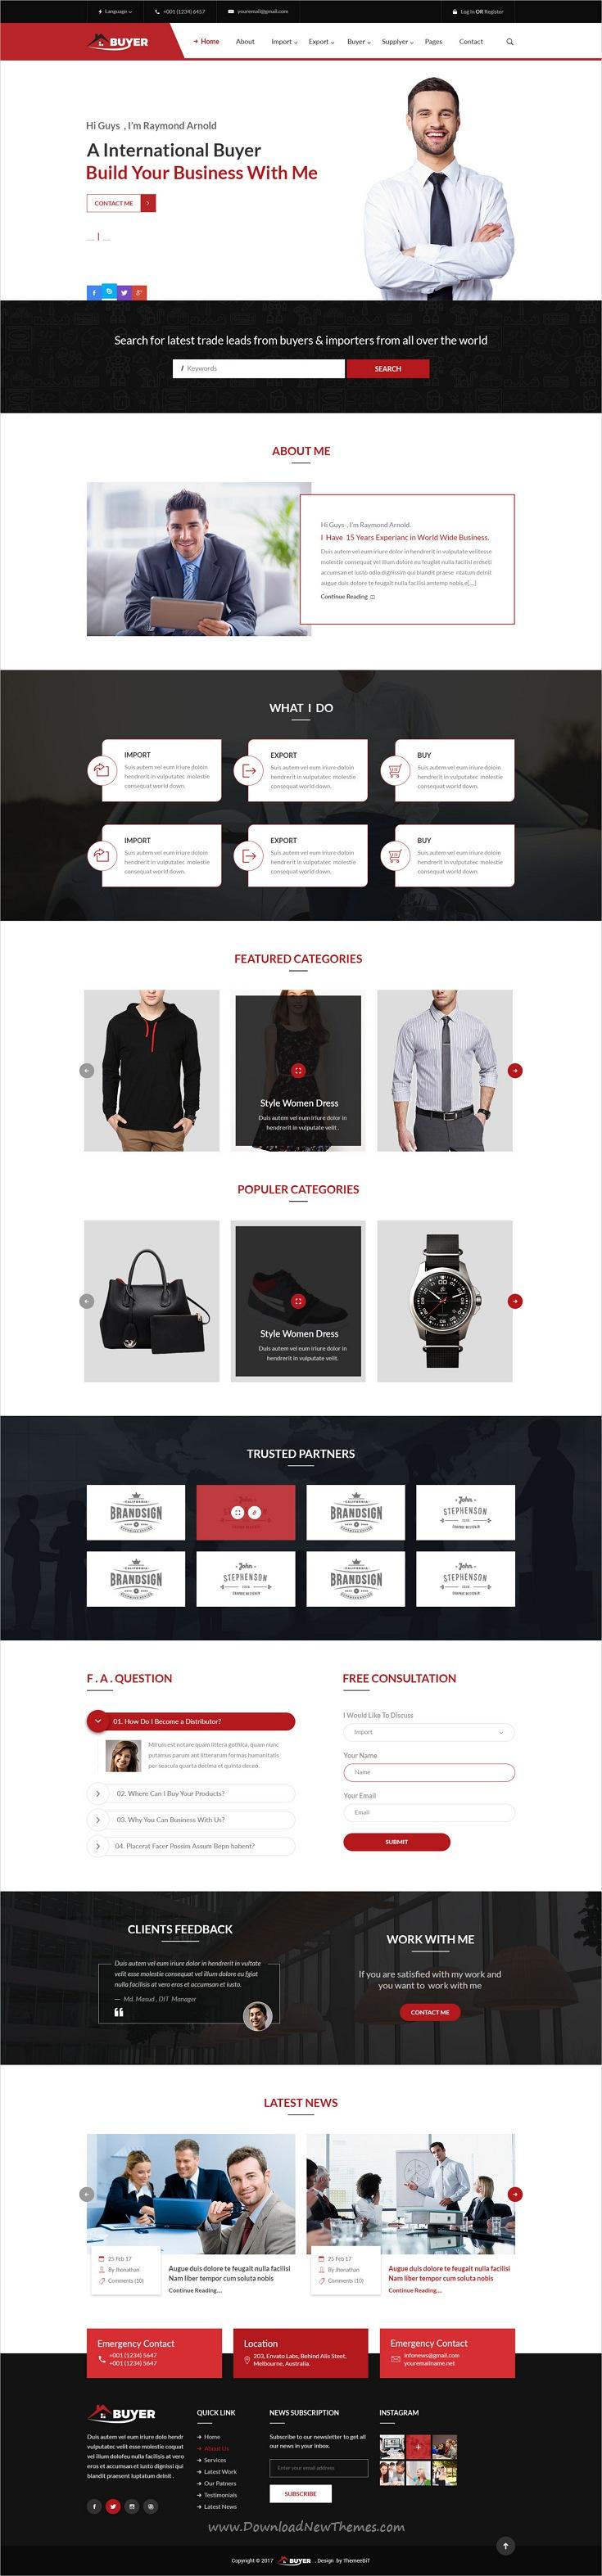 Buyer - Export/Import Business PSD Template | Psd templates ...